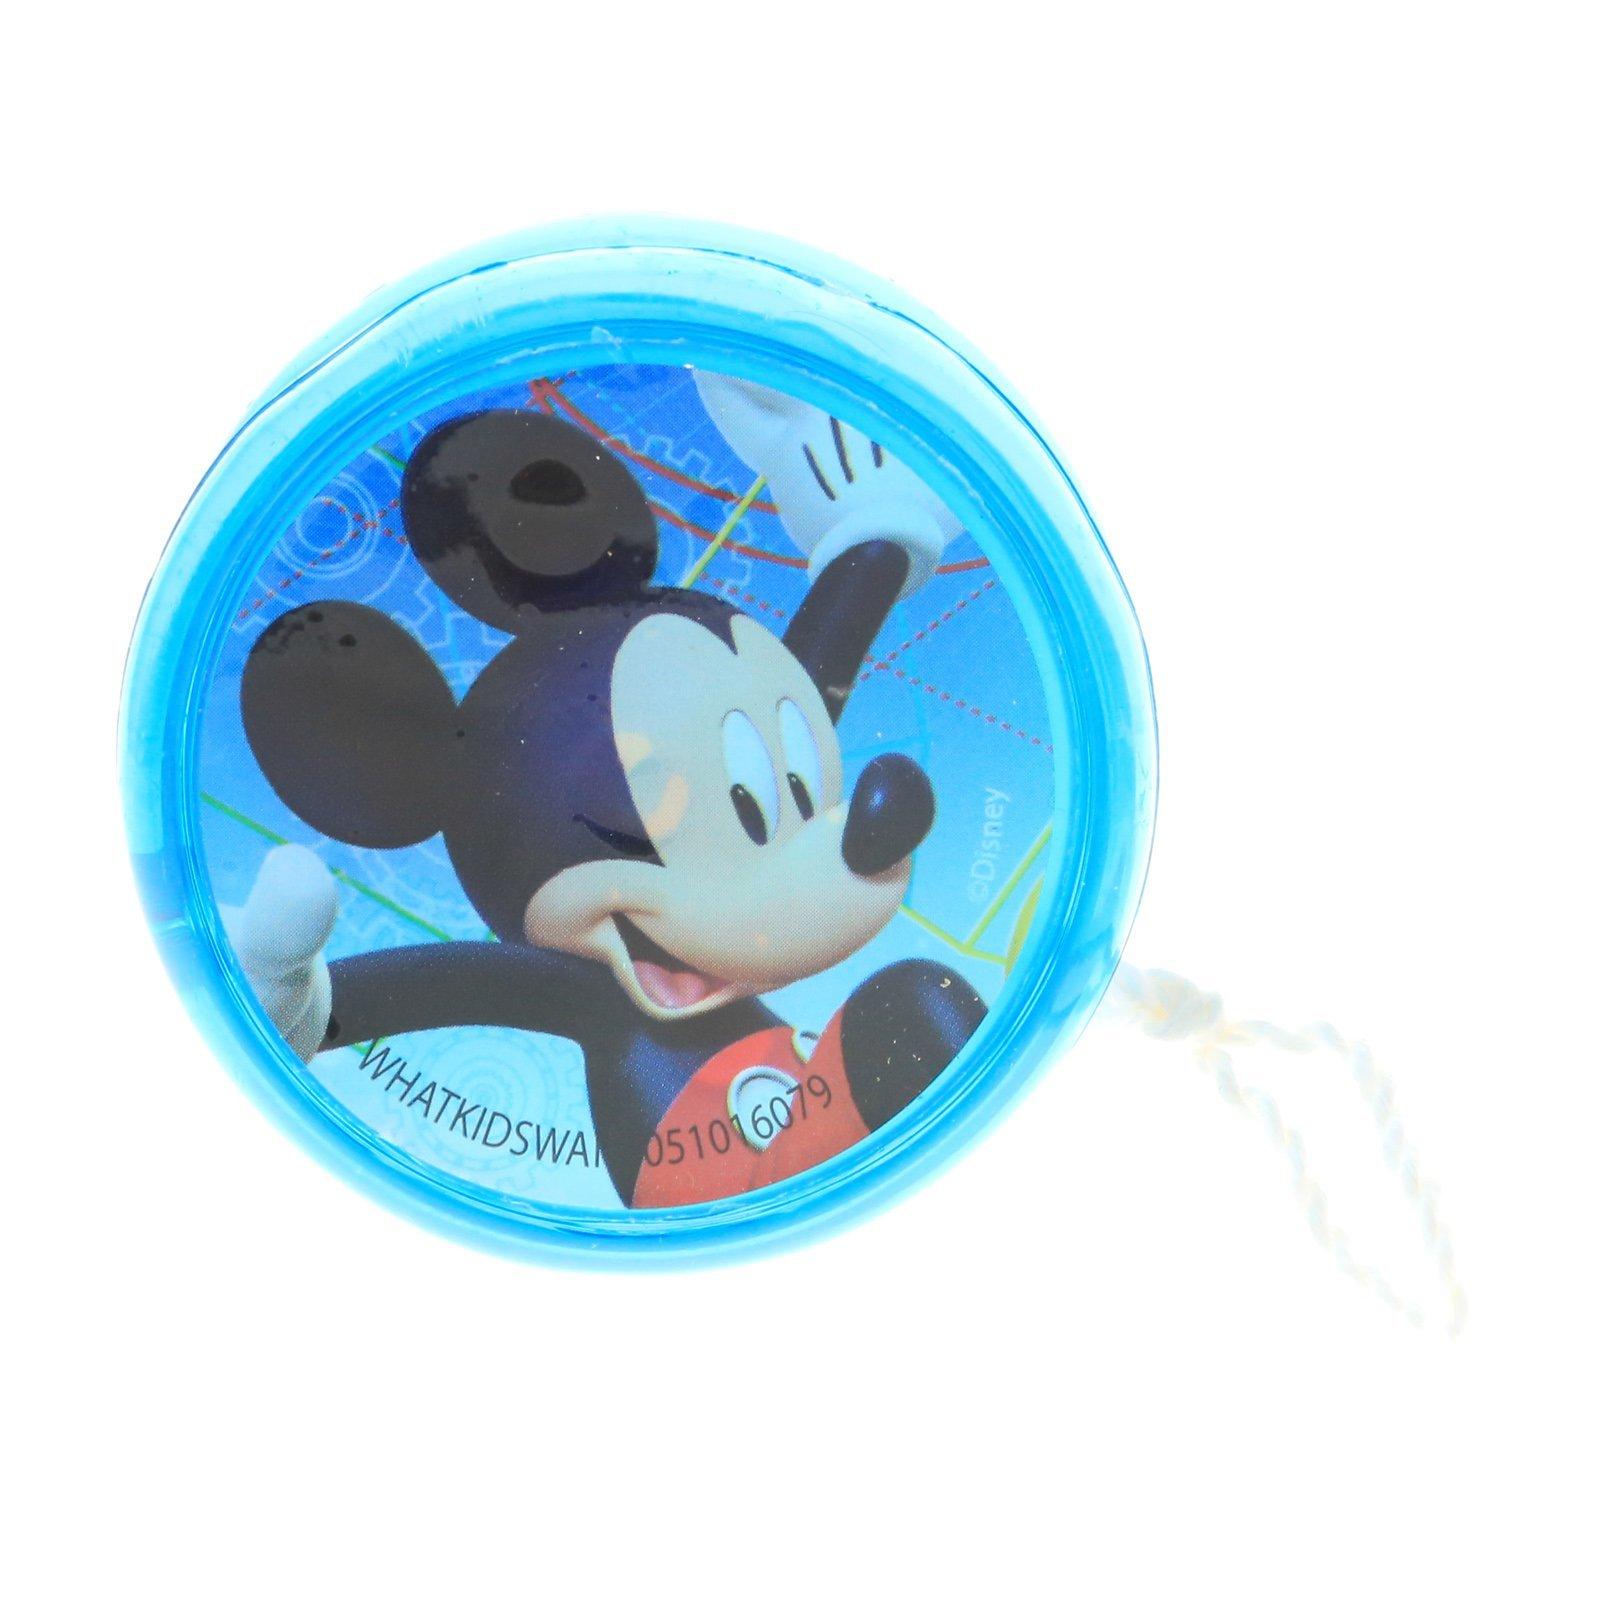 Disney Junior Pretend Play Mickey and the Roadster Racers Flashing Yo-Yo